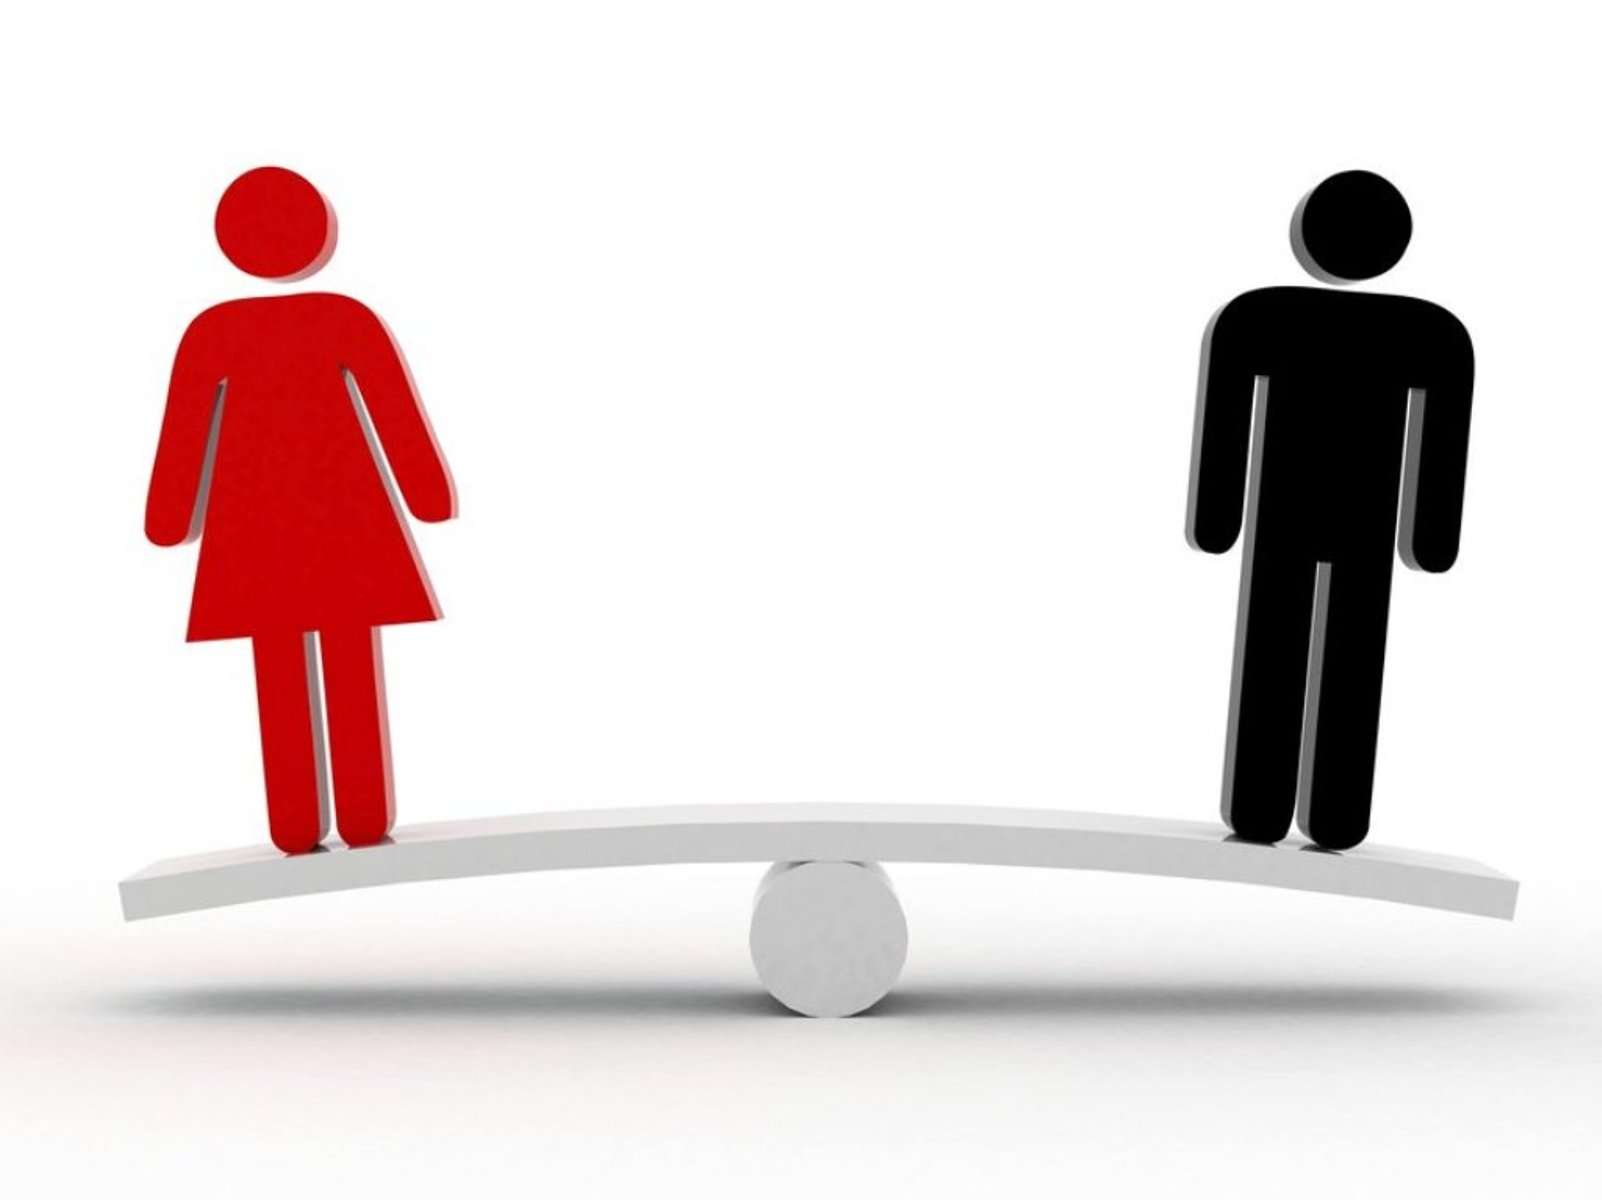 Мужчина и женщина, хламидийный